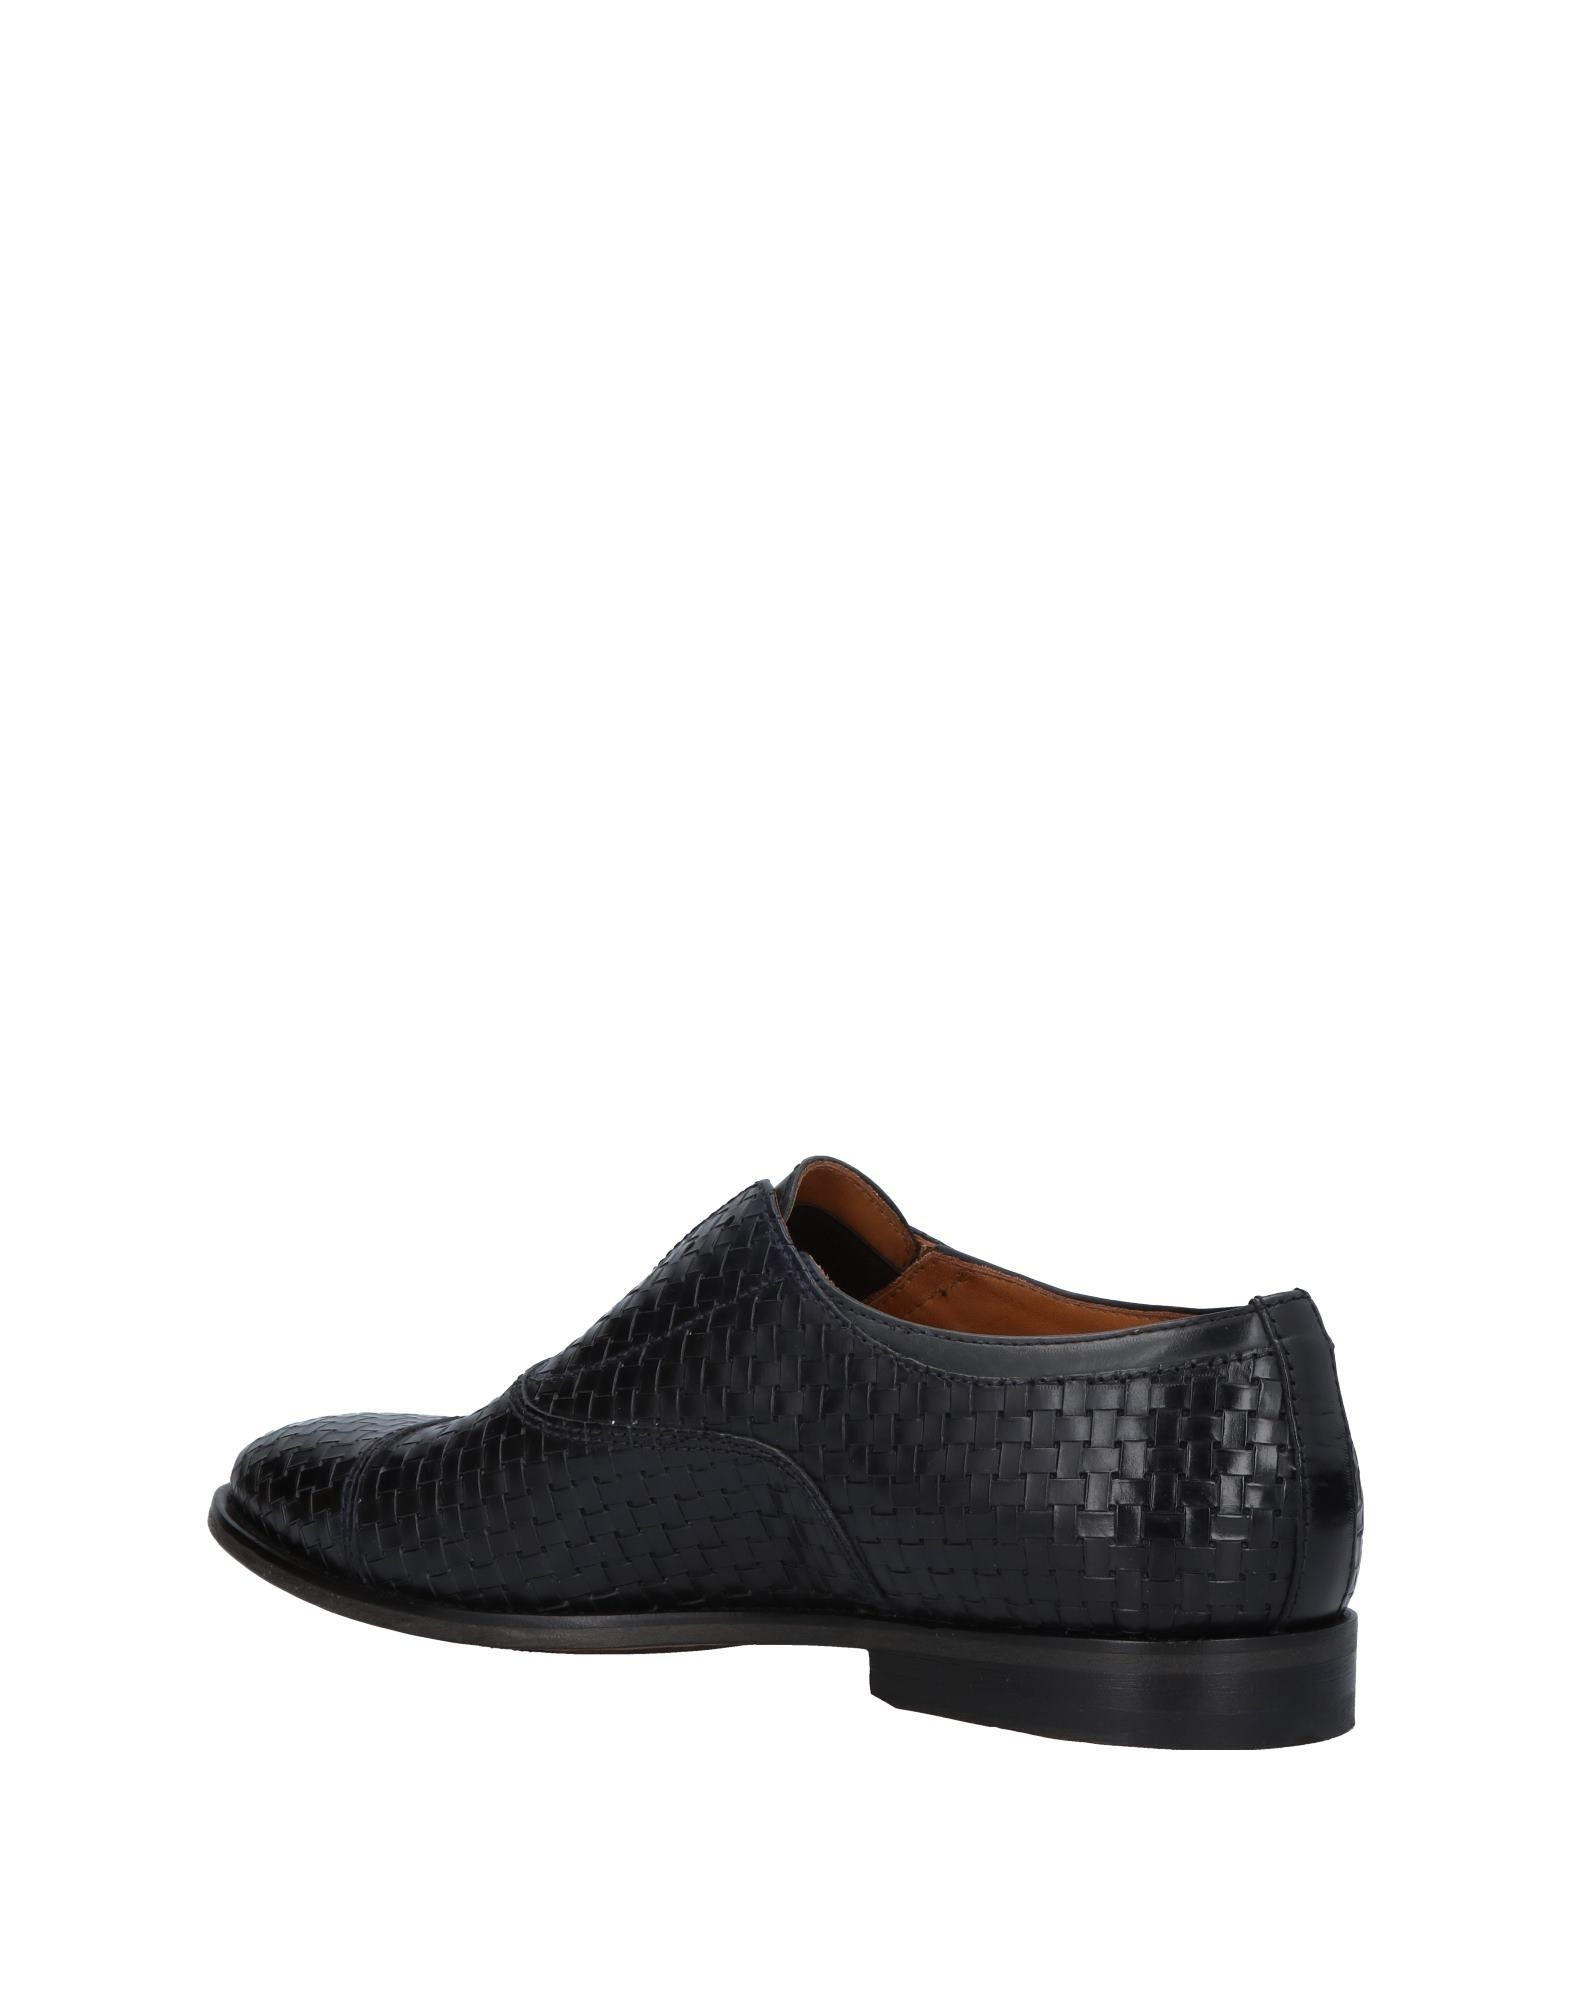 Doucal's Mokassins Schuhe Herren  11407238AK Heiße Schuhe Mokassins 3f921c